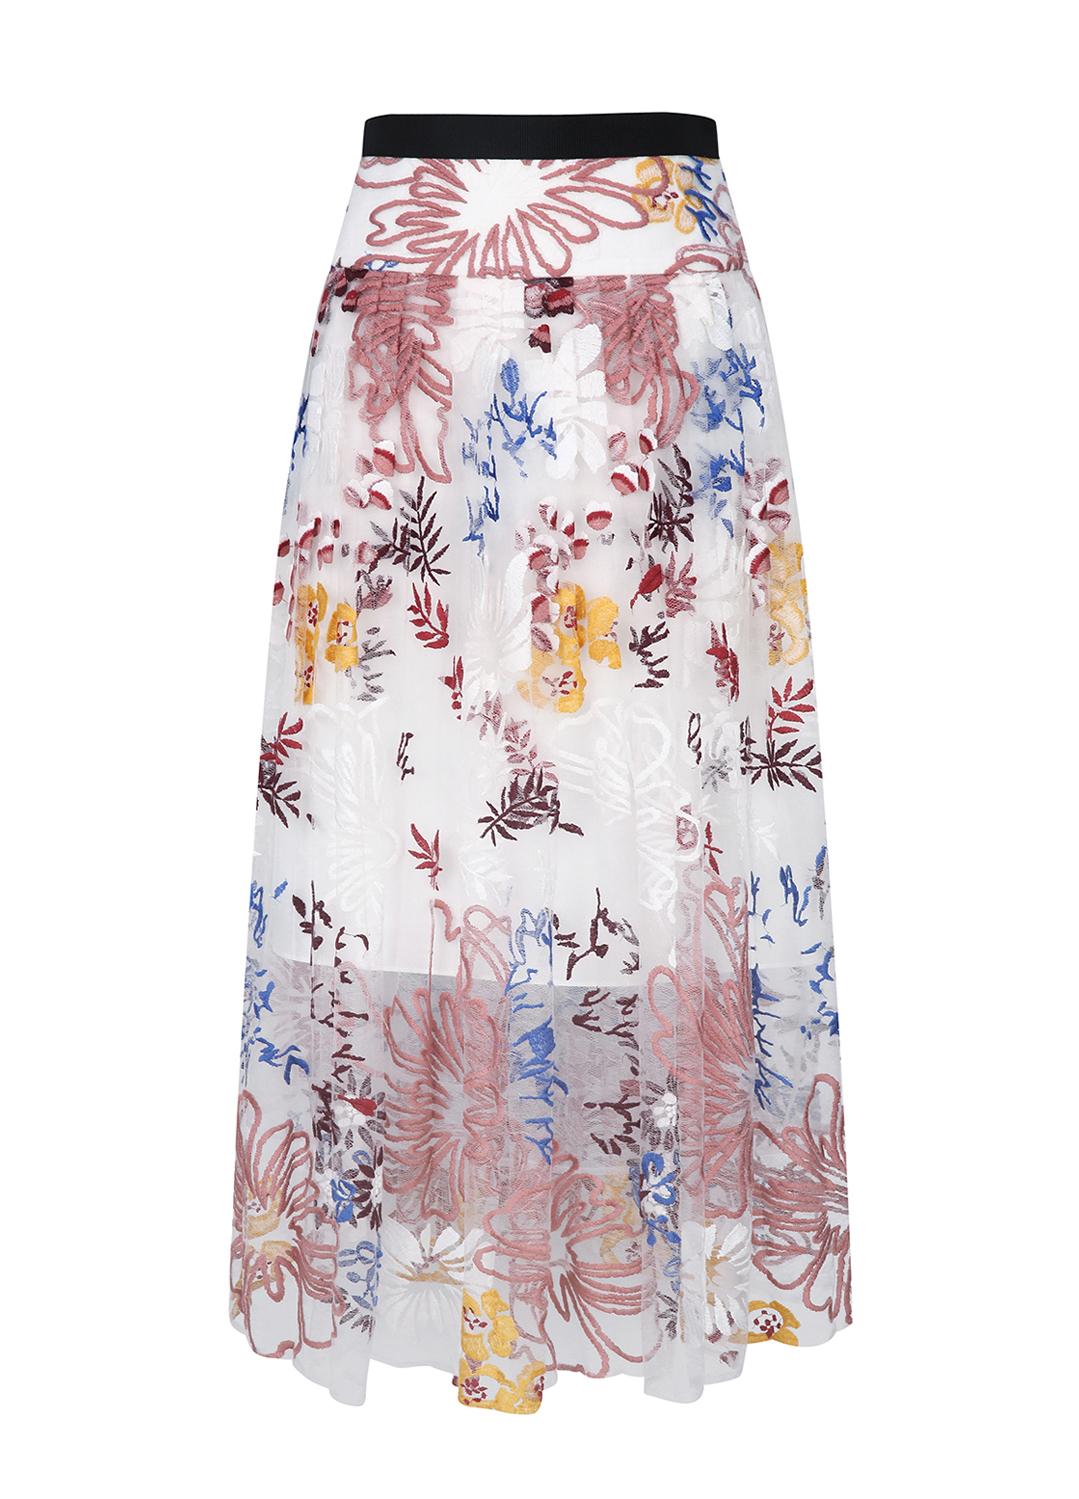 Lace Pleats Flower Patterned Skirt